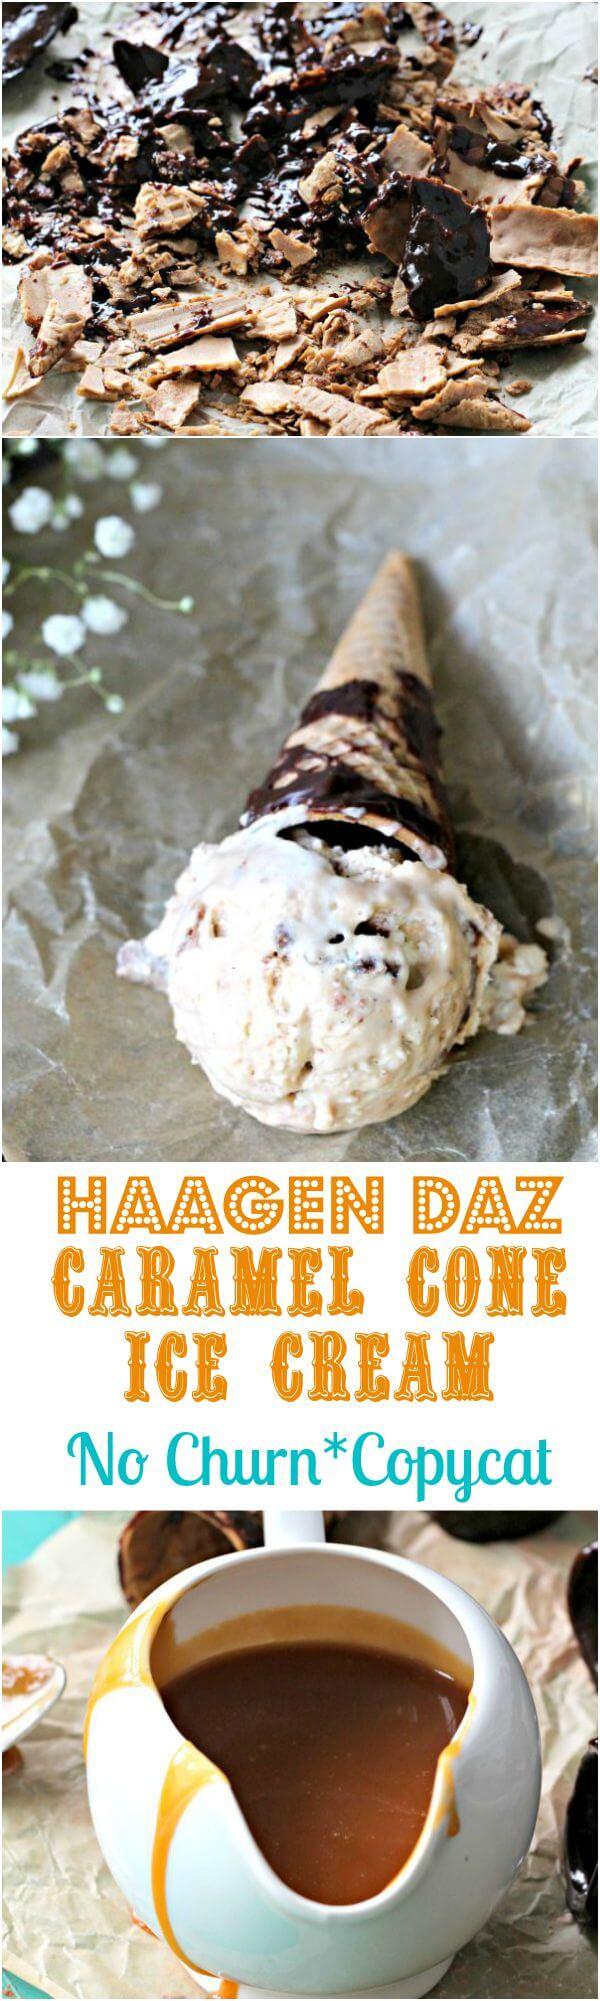 haagen daz caramel cone ice cream